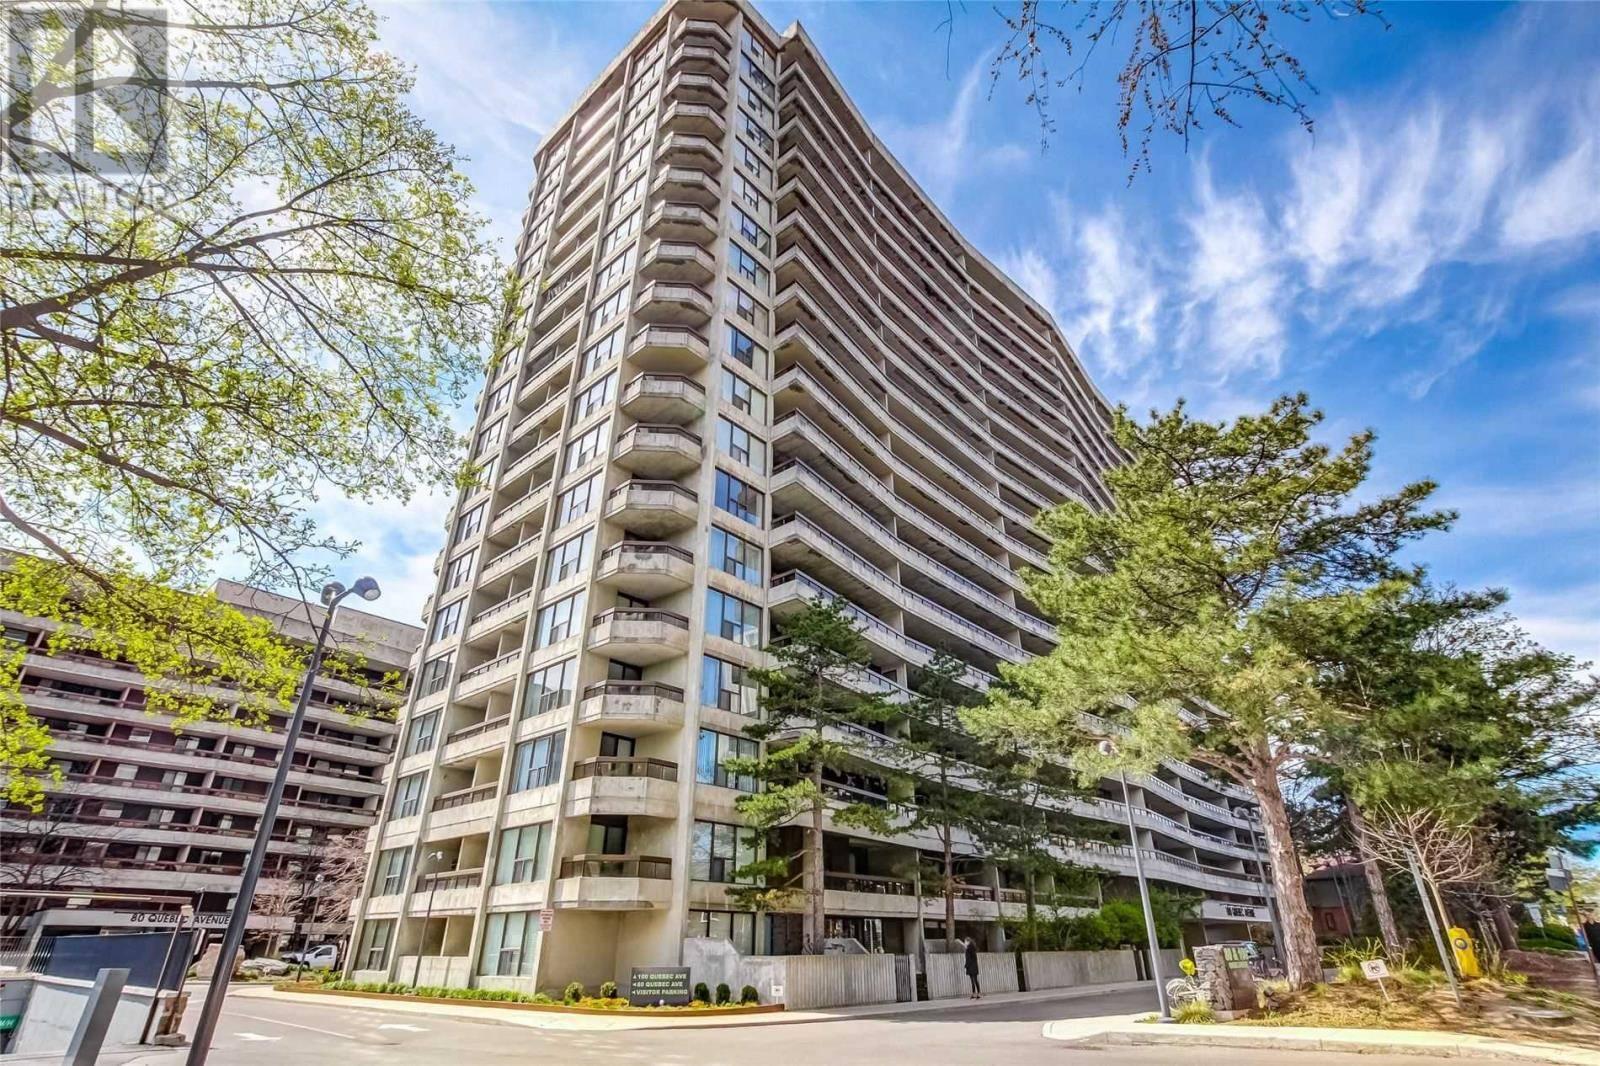 Condo for sale at 100 Quebec Ave West Unit 116 Toronto Ontario - MLS: W4756547